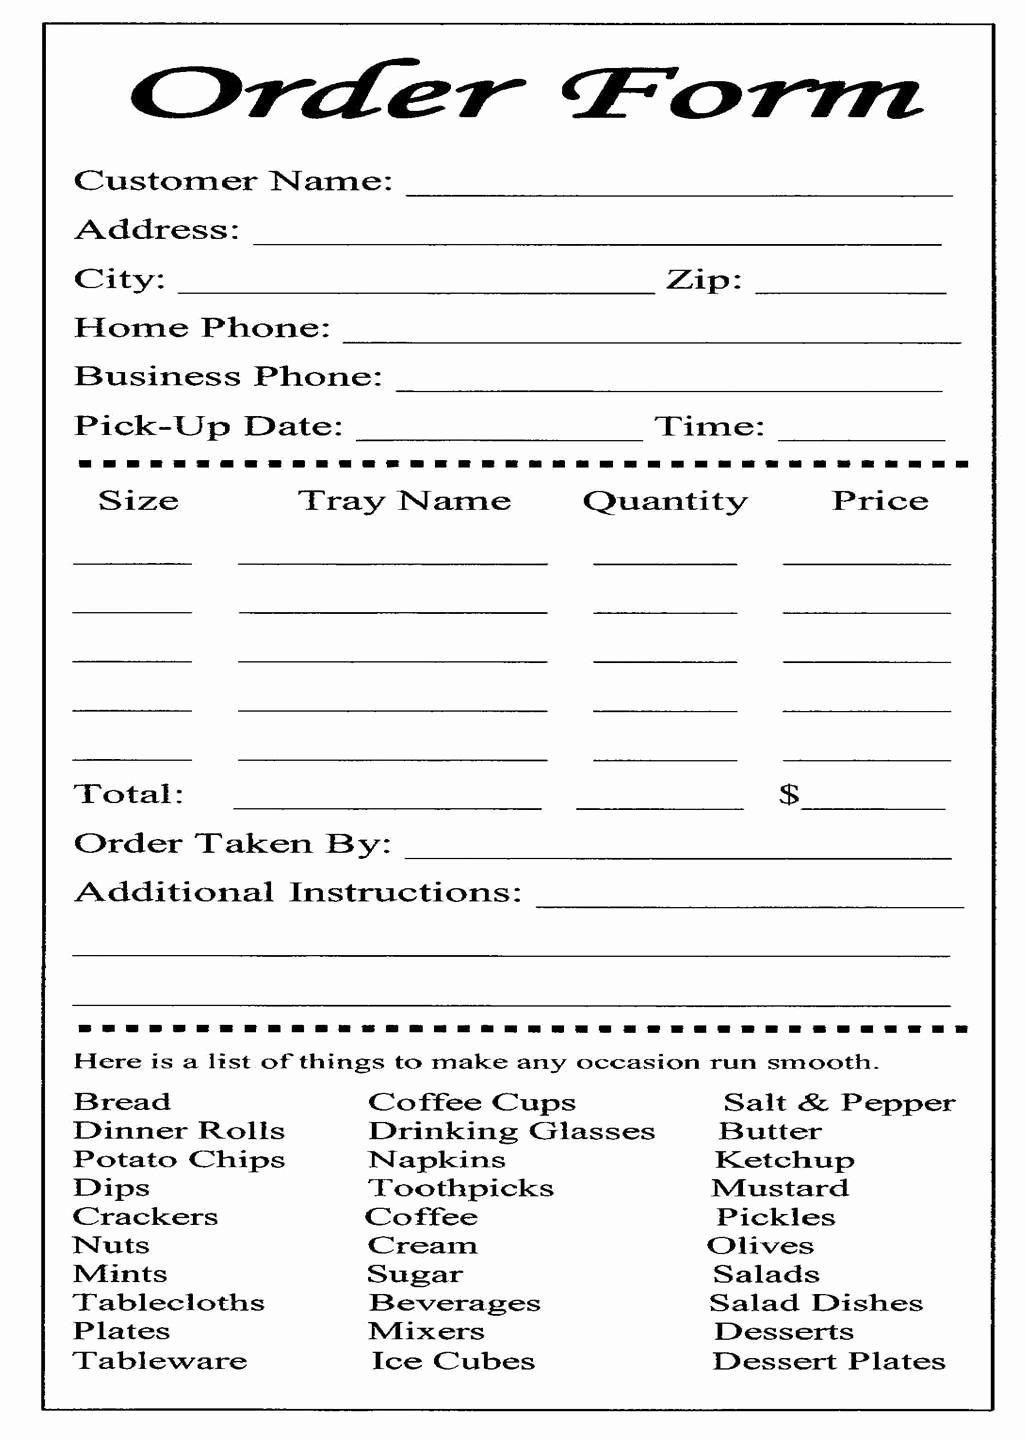 Bakery order form Template Free Elegant Cake Ball order form Templates Free